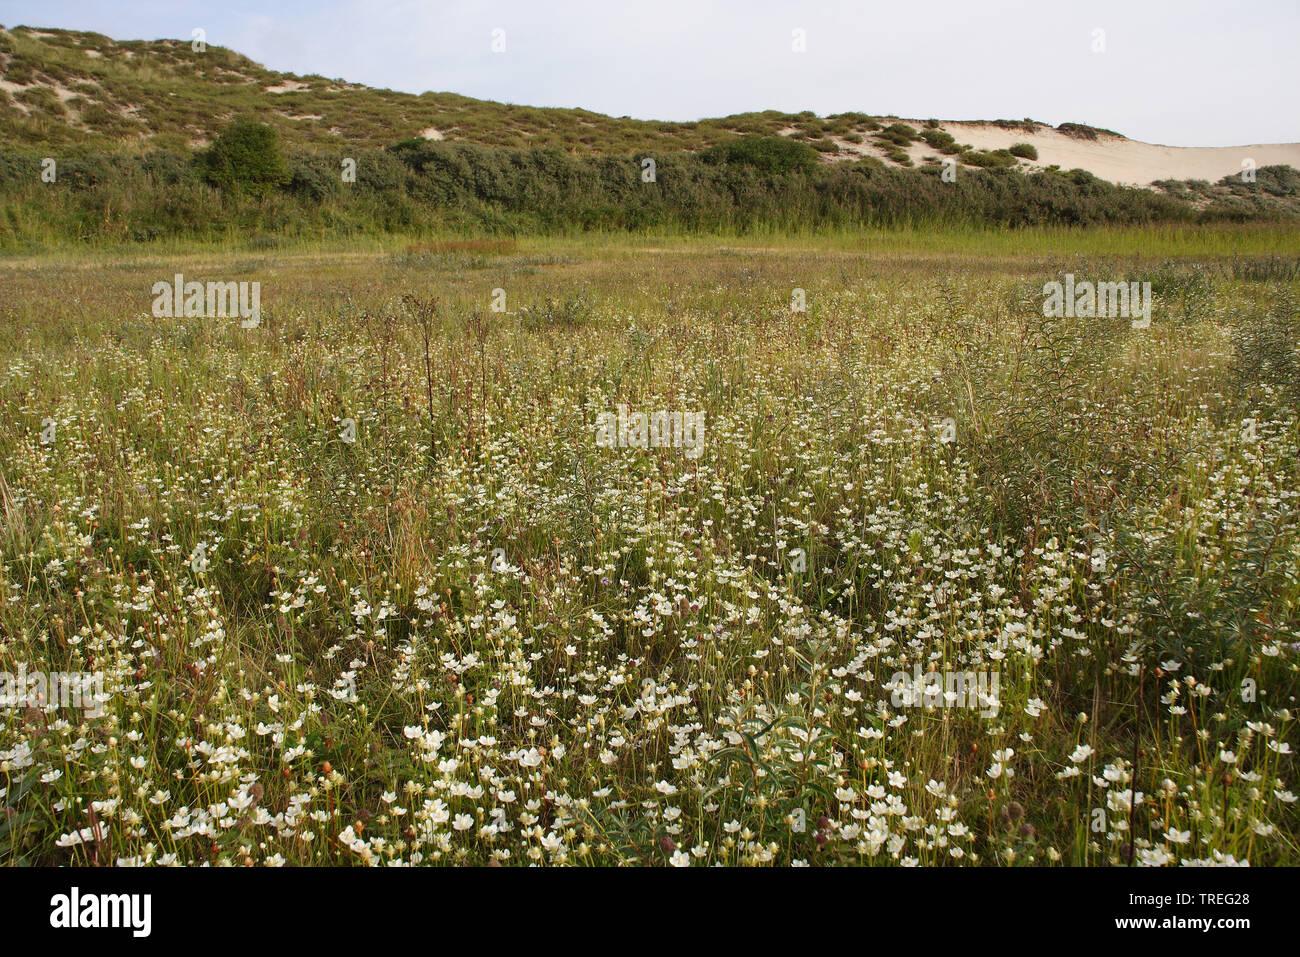 Sumpf-Herzblatt, Sumpfherzblatt, Herzblatt (Parnassia palustris), bluehend in den Duenen, Niederlande, Berkheide, Wassenaar | marsh grass-of-parnassus - Stock Image